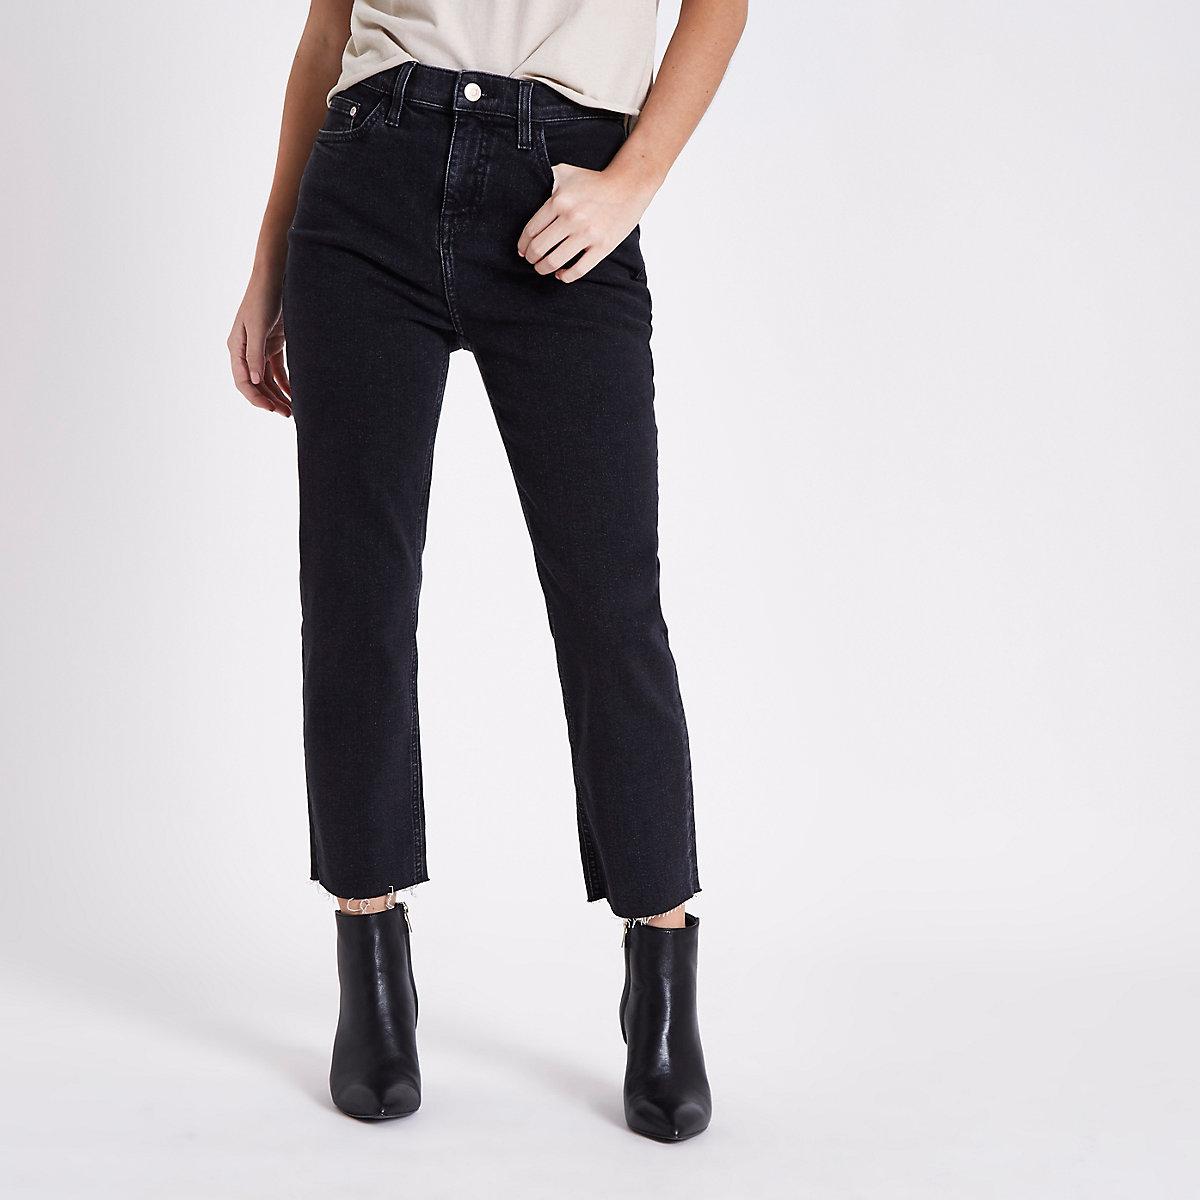 Petite black Bella straight leg jeans